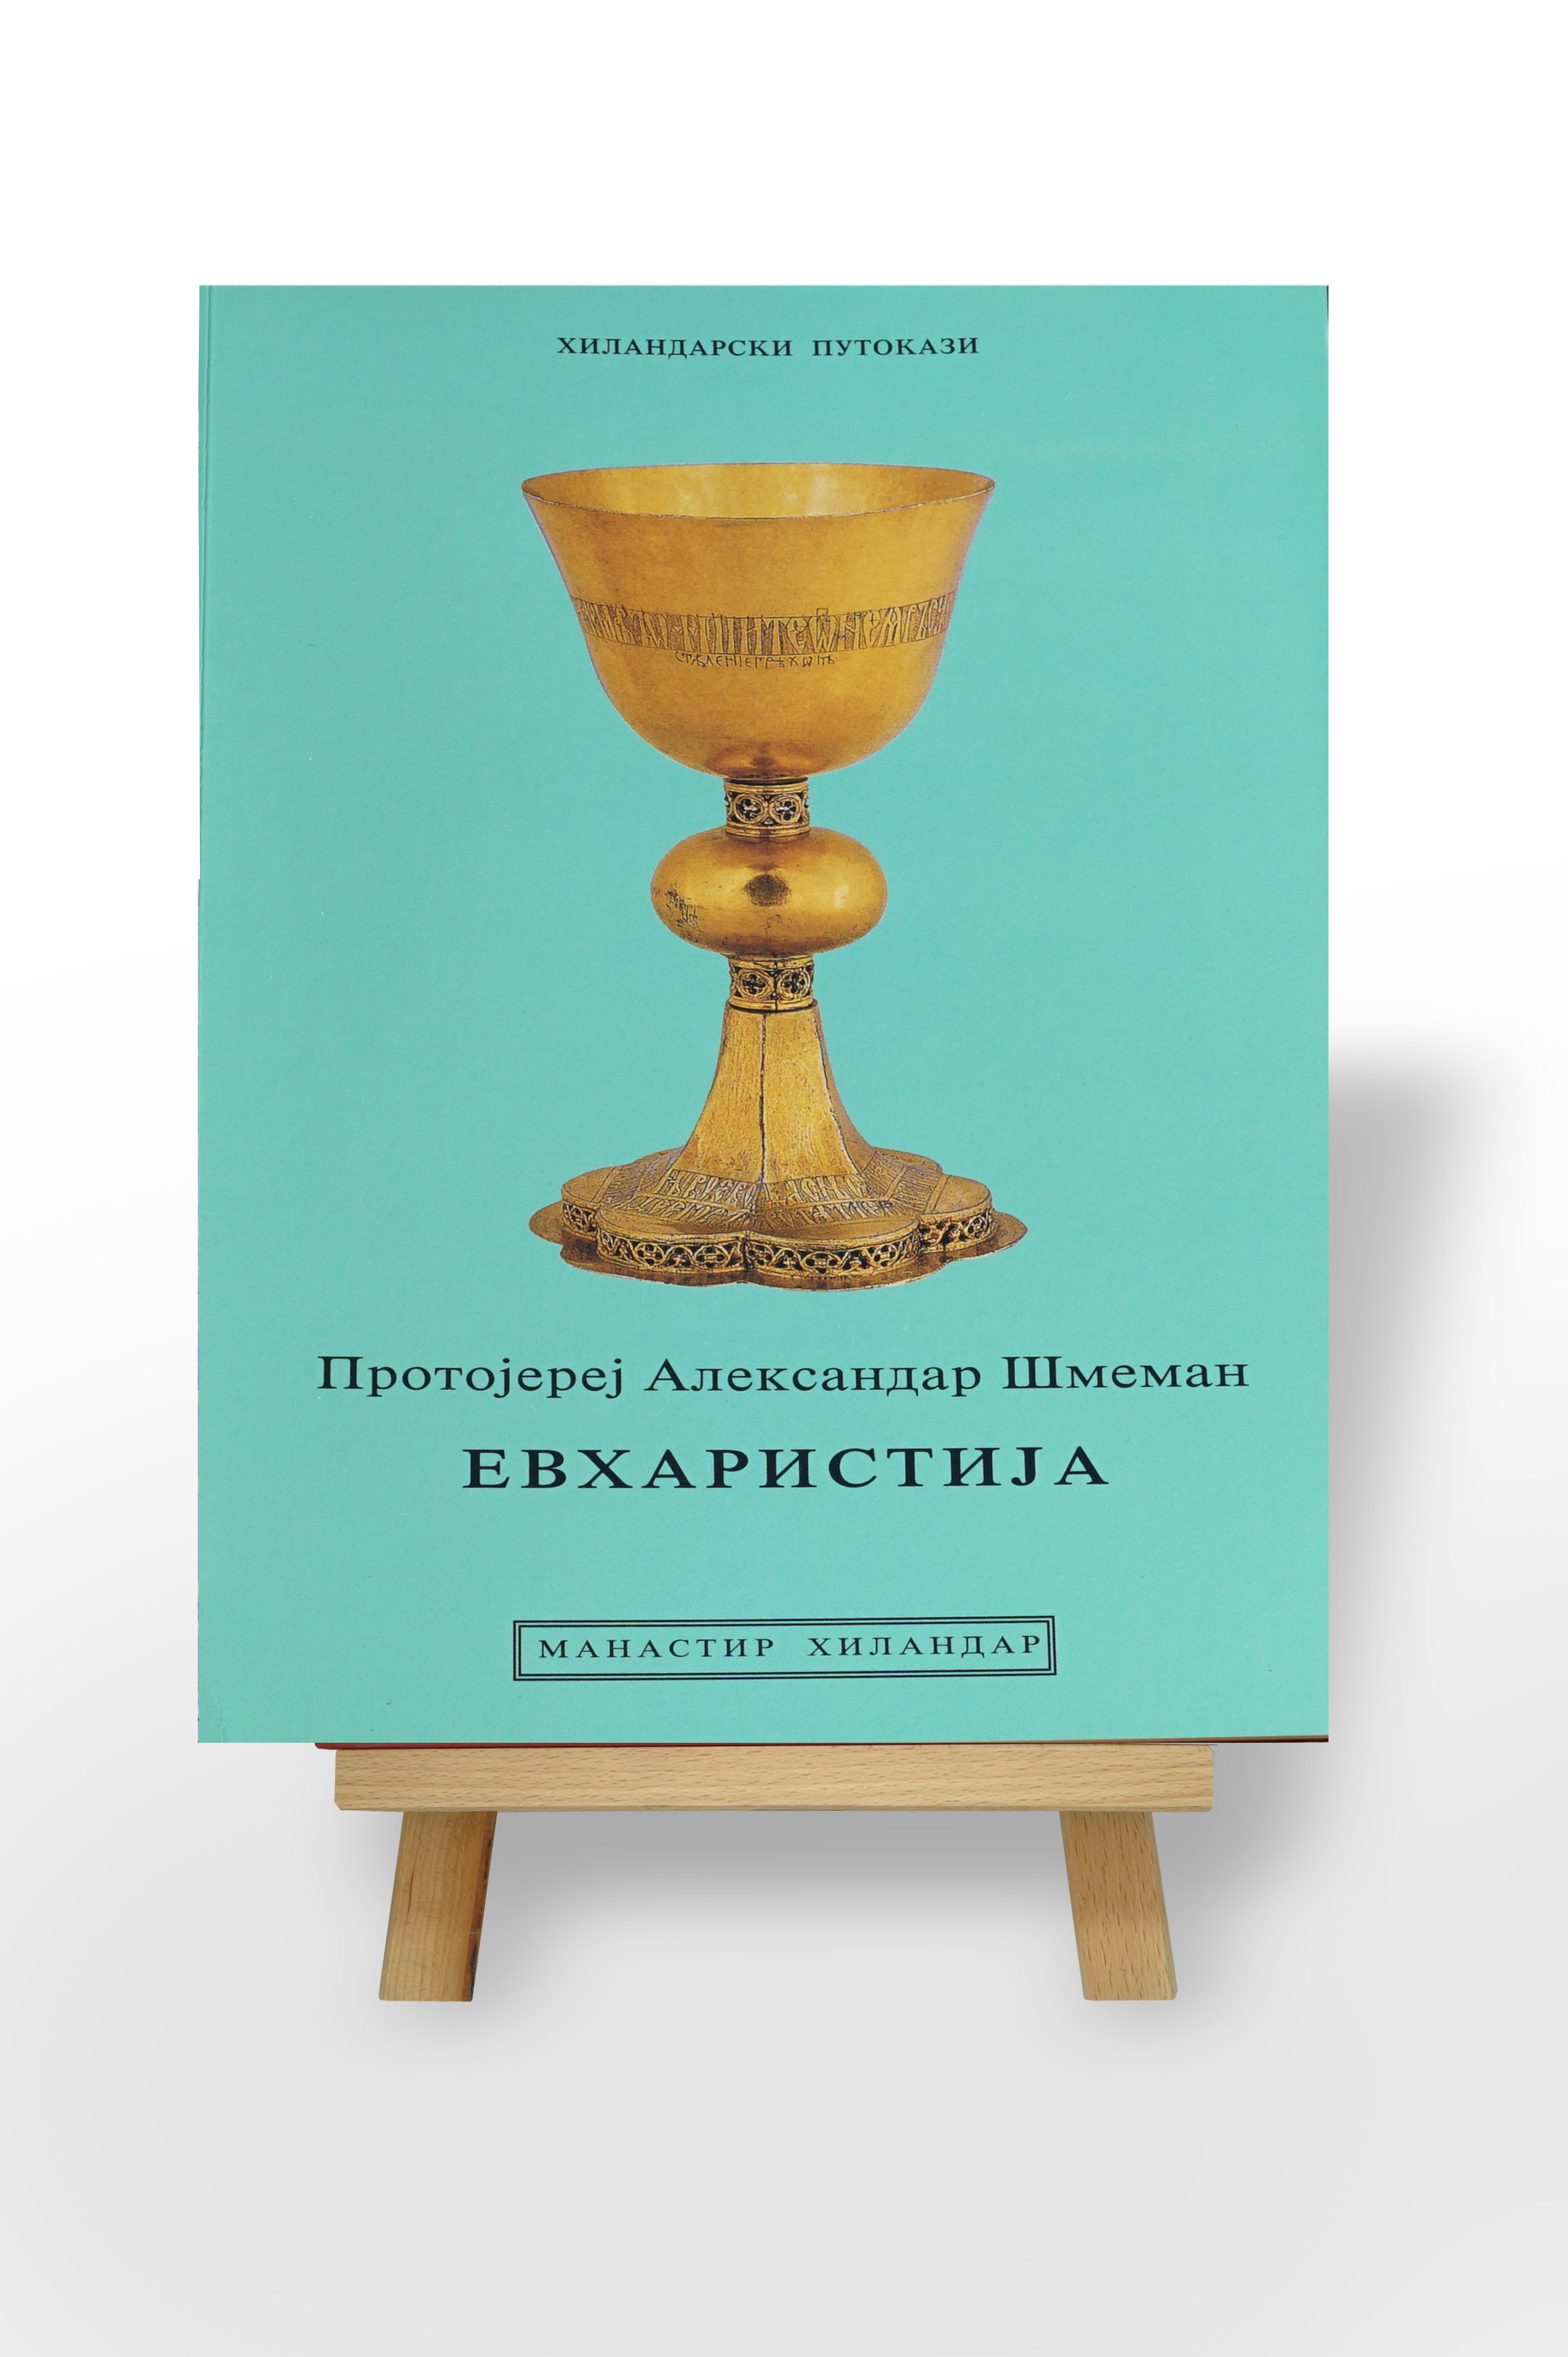 Протојереј Александар Шмеман, Евхаристија